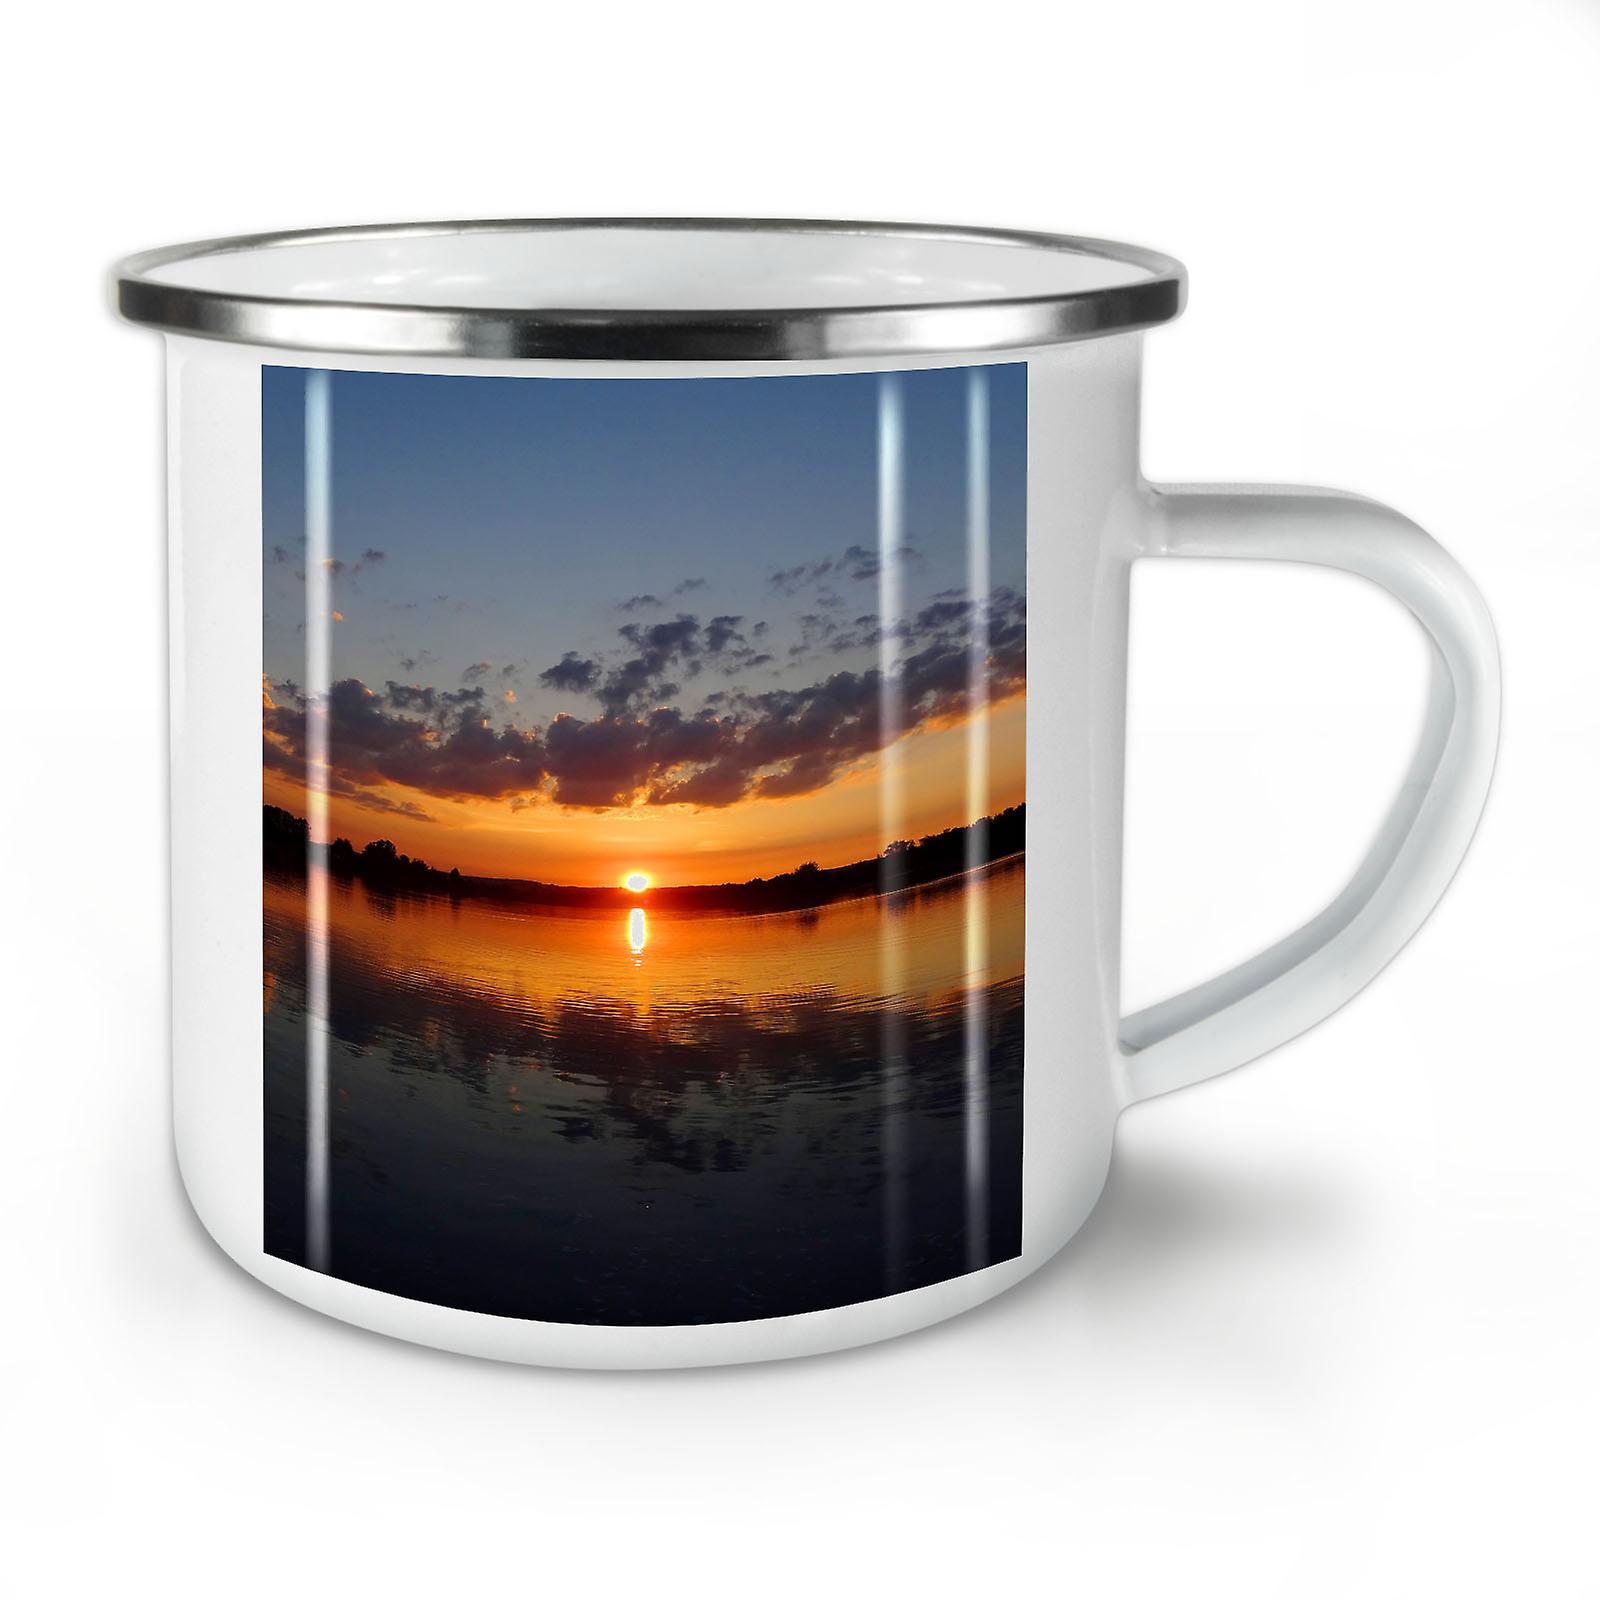 Sonnenuntergang See Foto Natur neu WhiteTea Kaffee Emaille Mug10 oz | Wellcoda